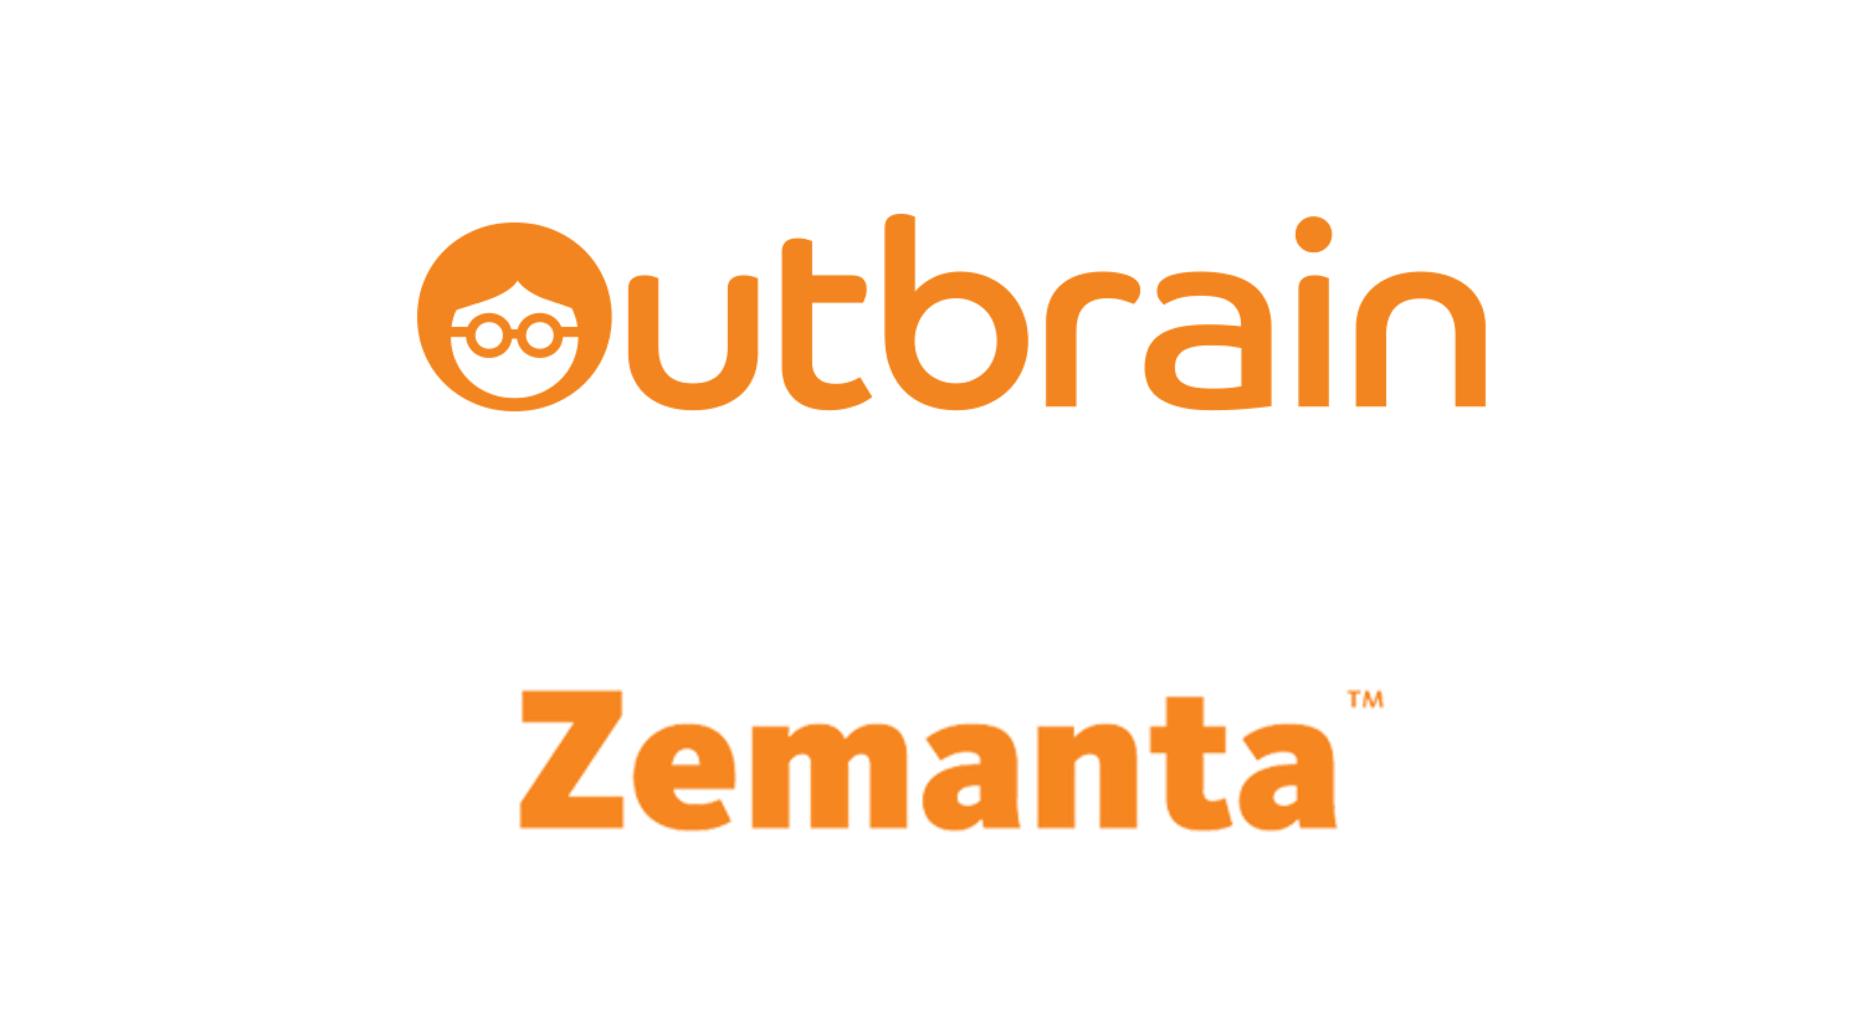 outbrain_zemanta